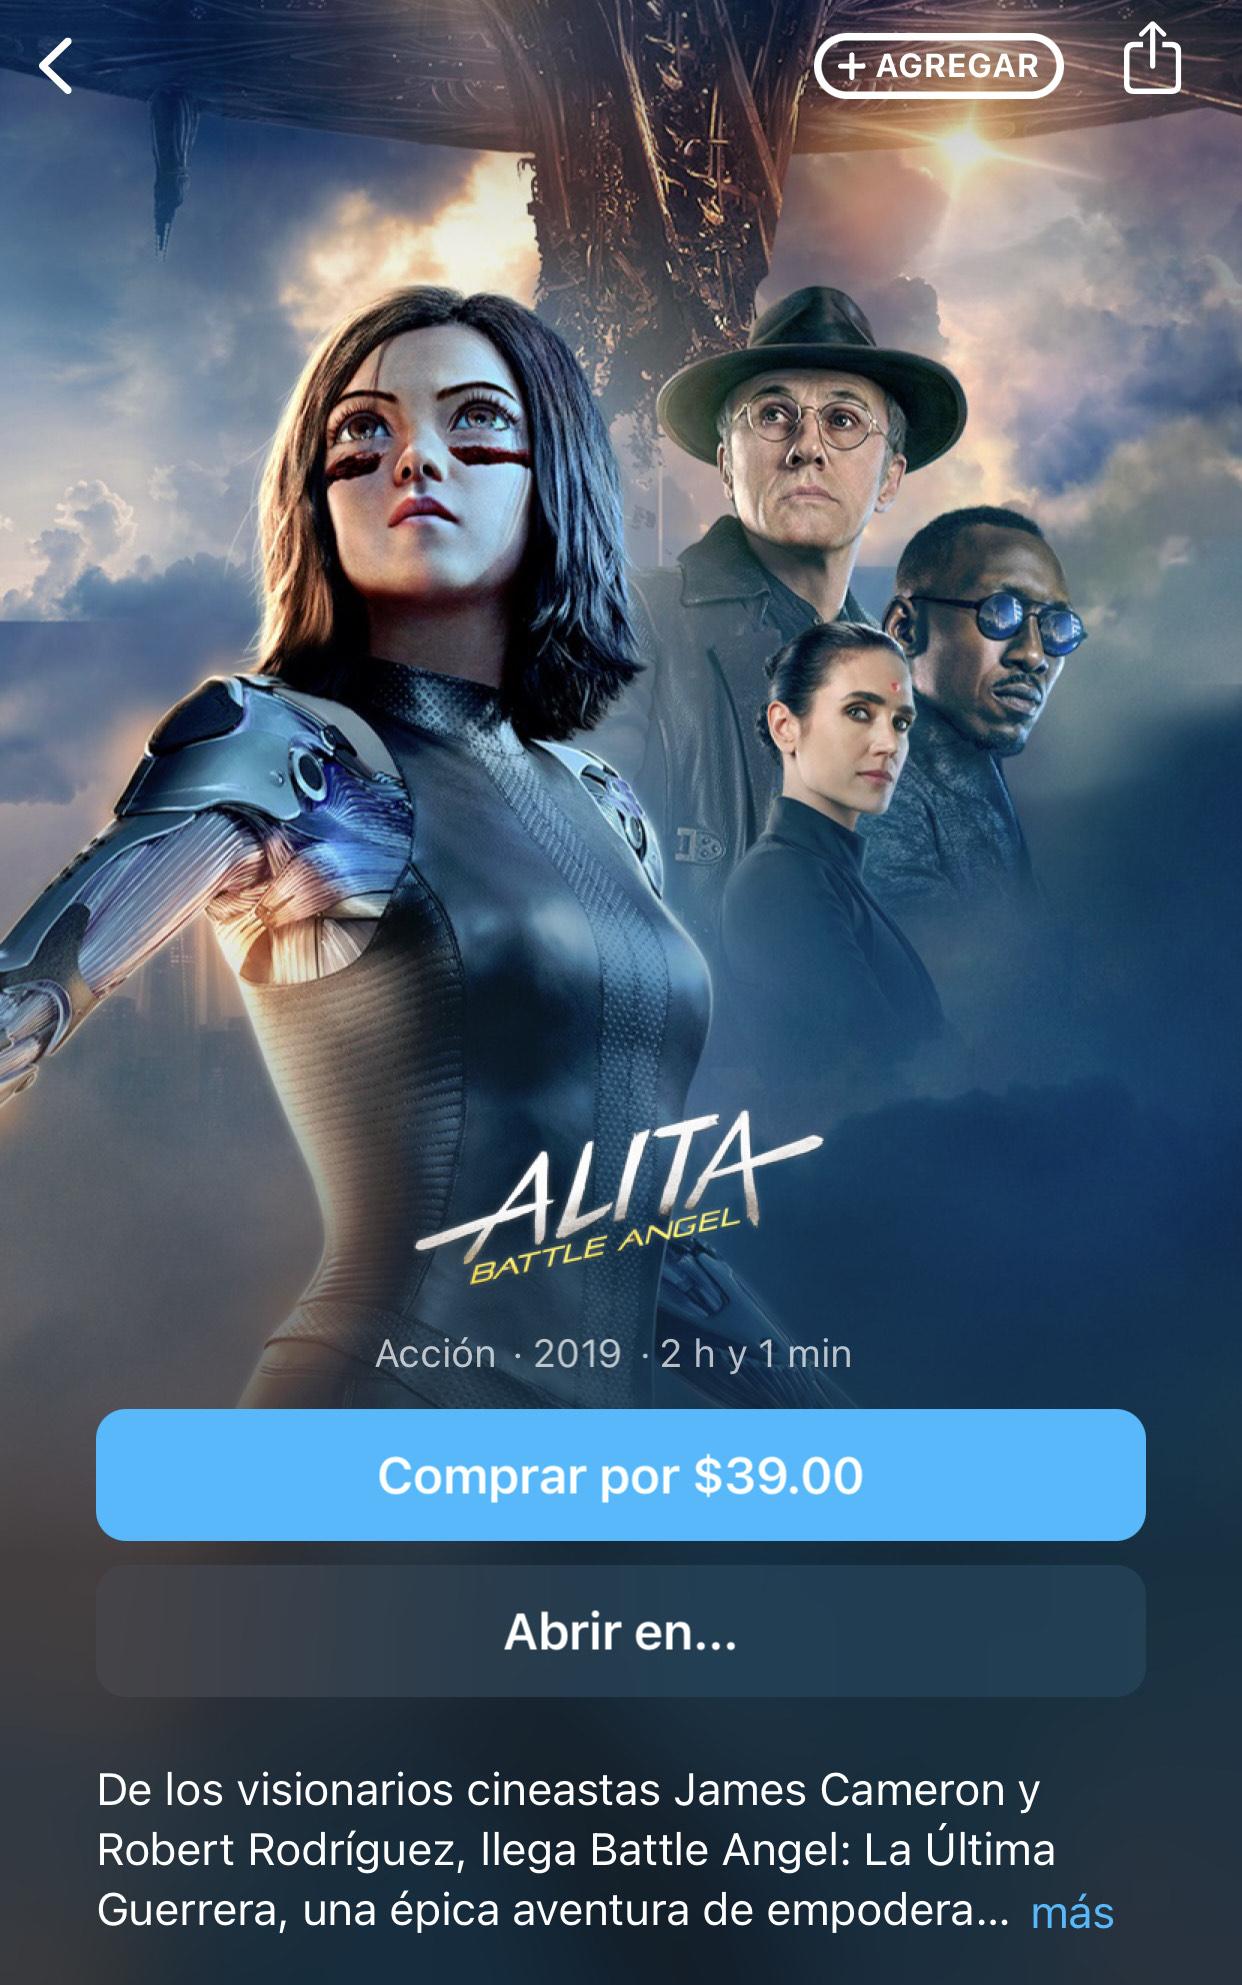 iTunes: ALITA BATTLE ANGEL 4k